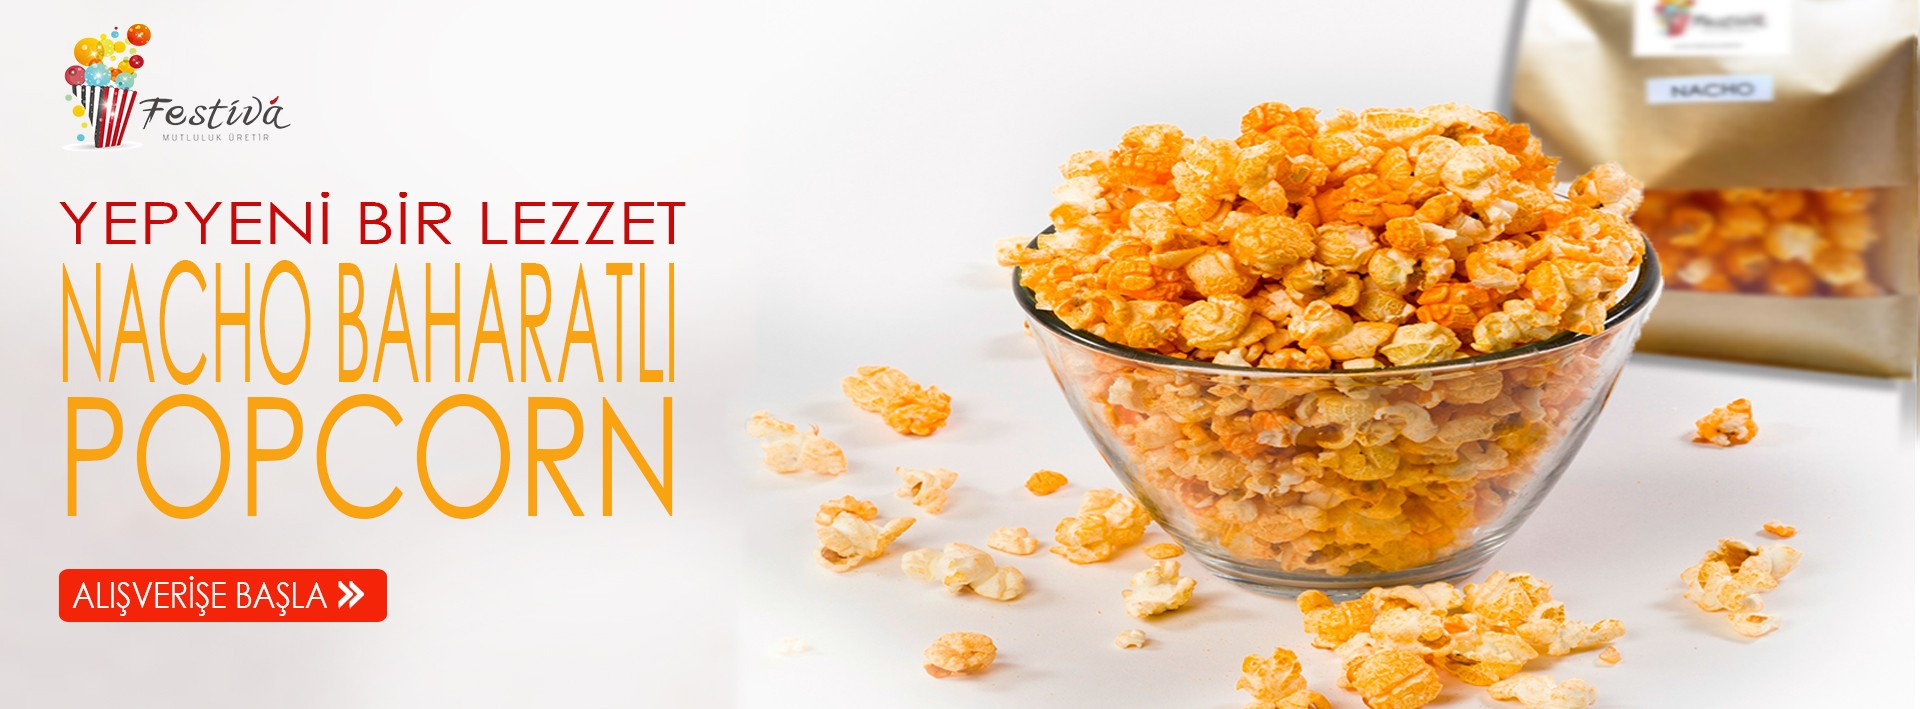 Yepyeni bir lezzet. Nacho Baharatlı Popcorn.